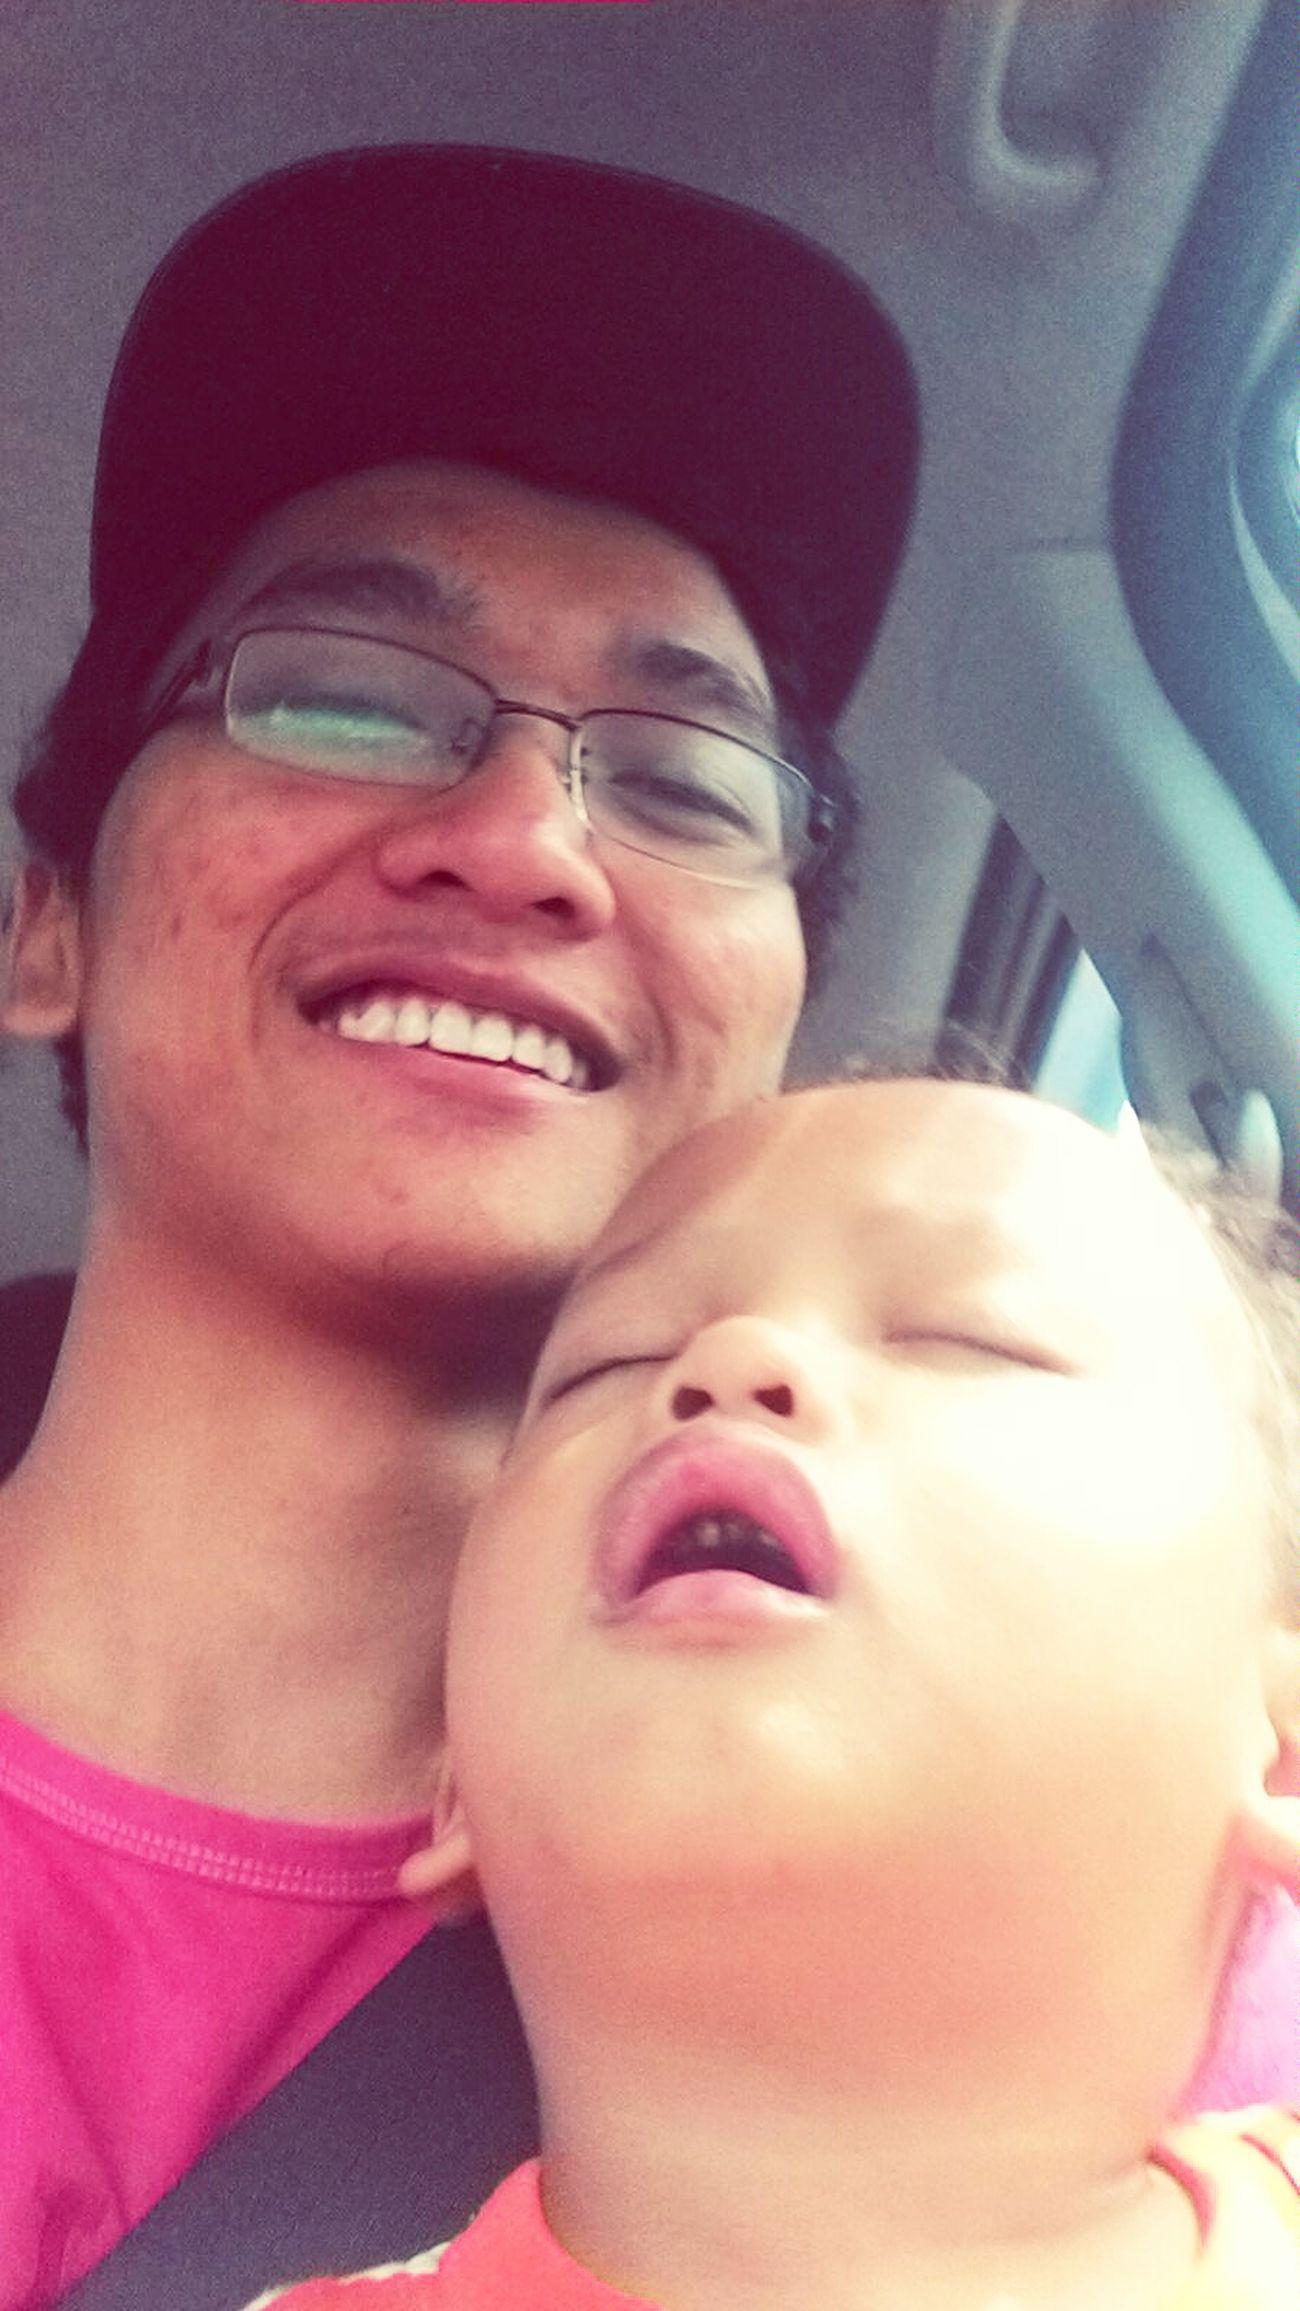 Littlebrother Noteethsmile Sleepy with Rainy Days